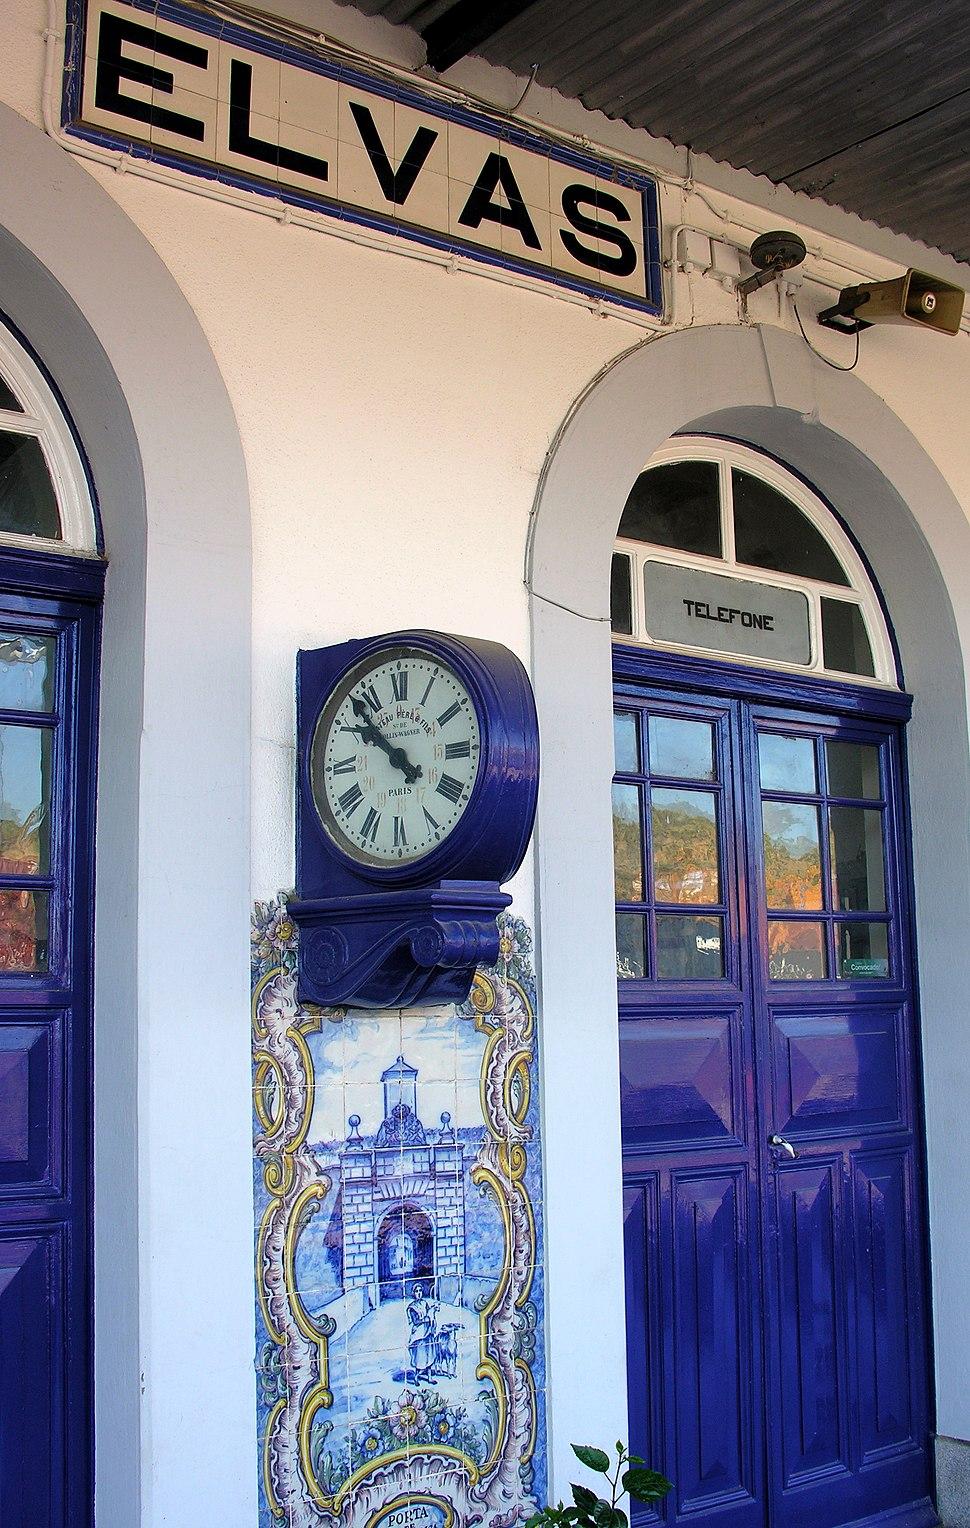 Elvas Station, Alentejo, Portugal